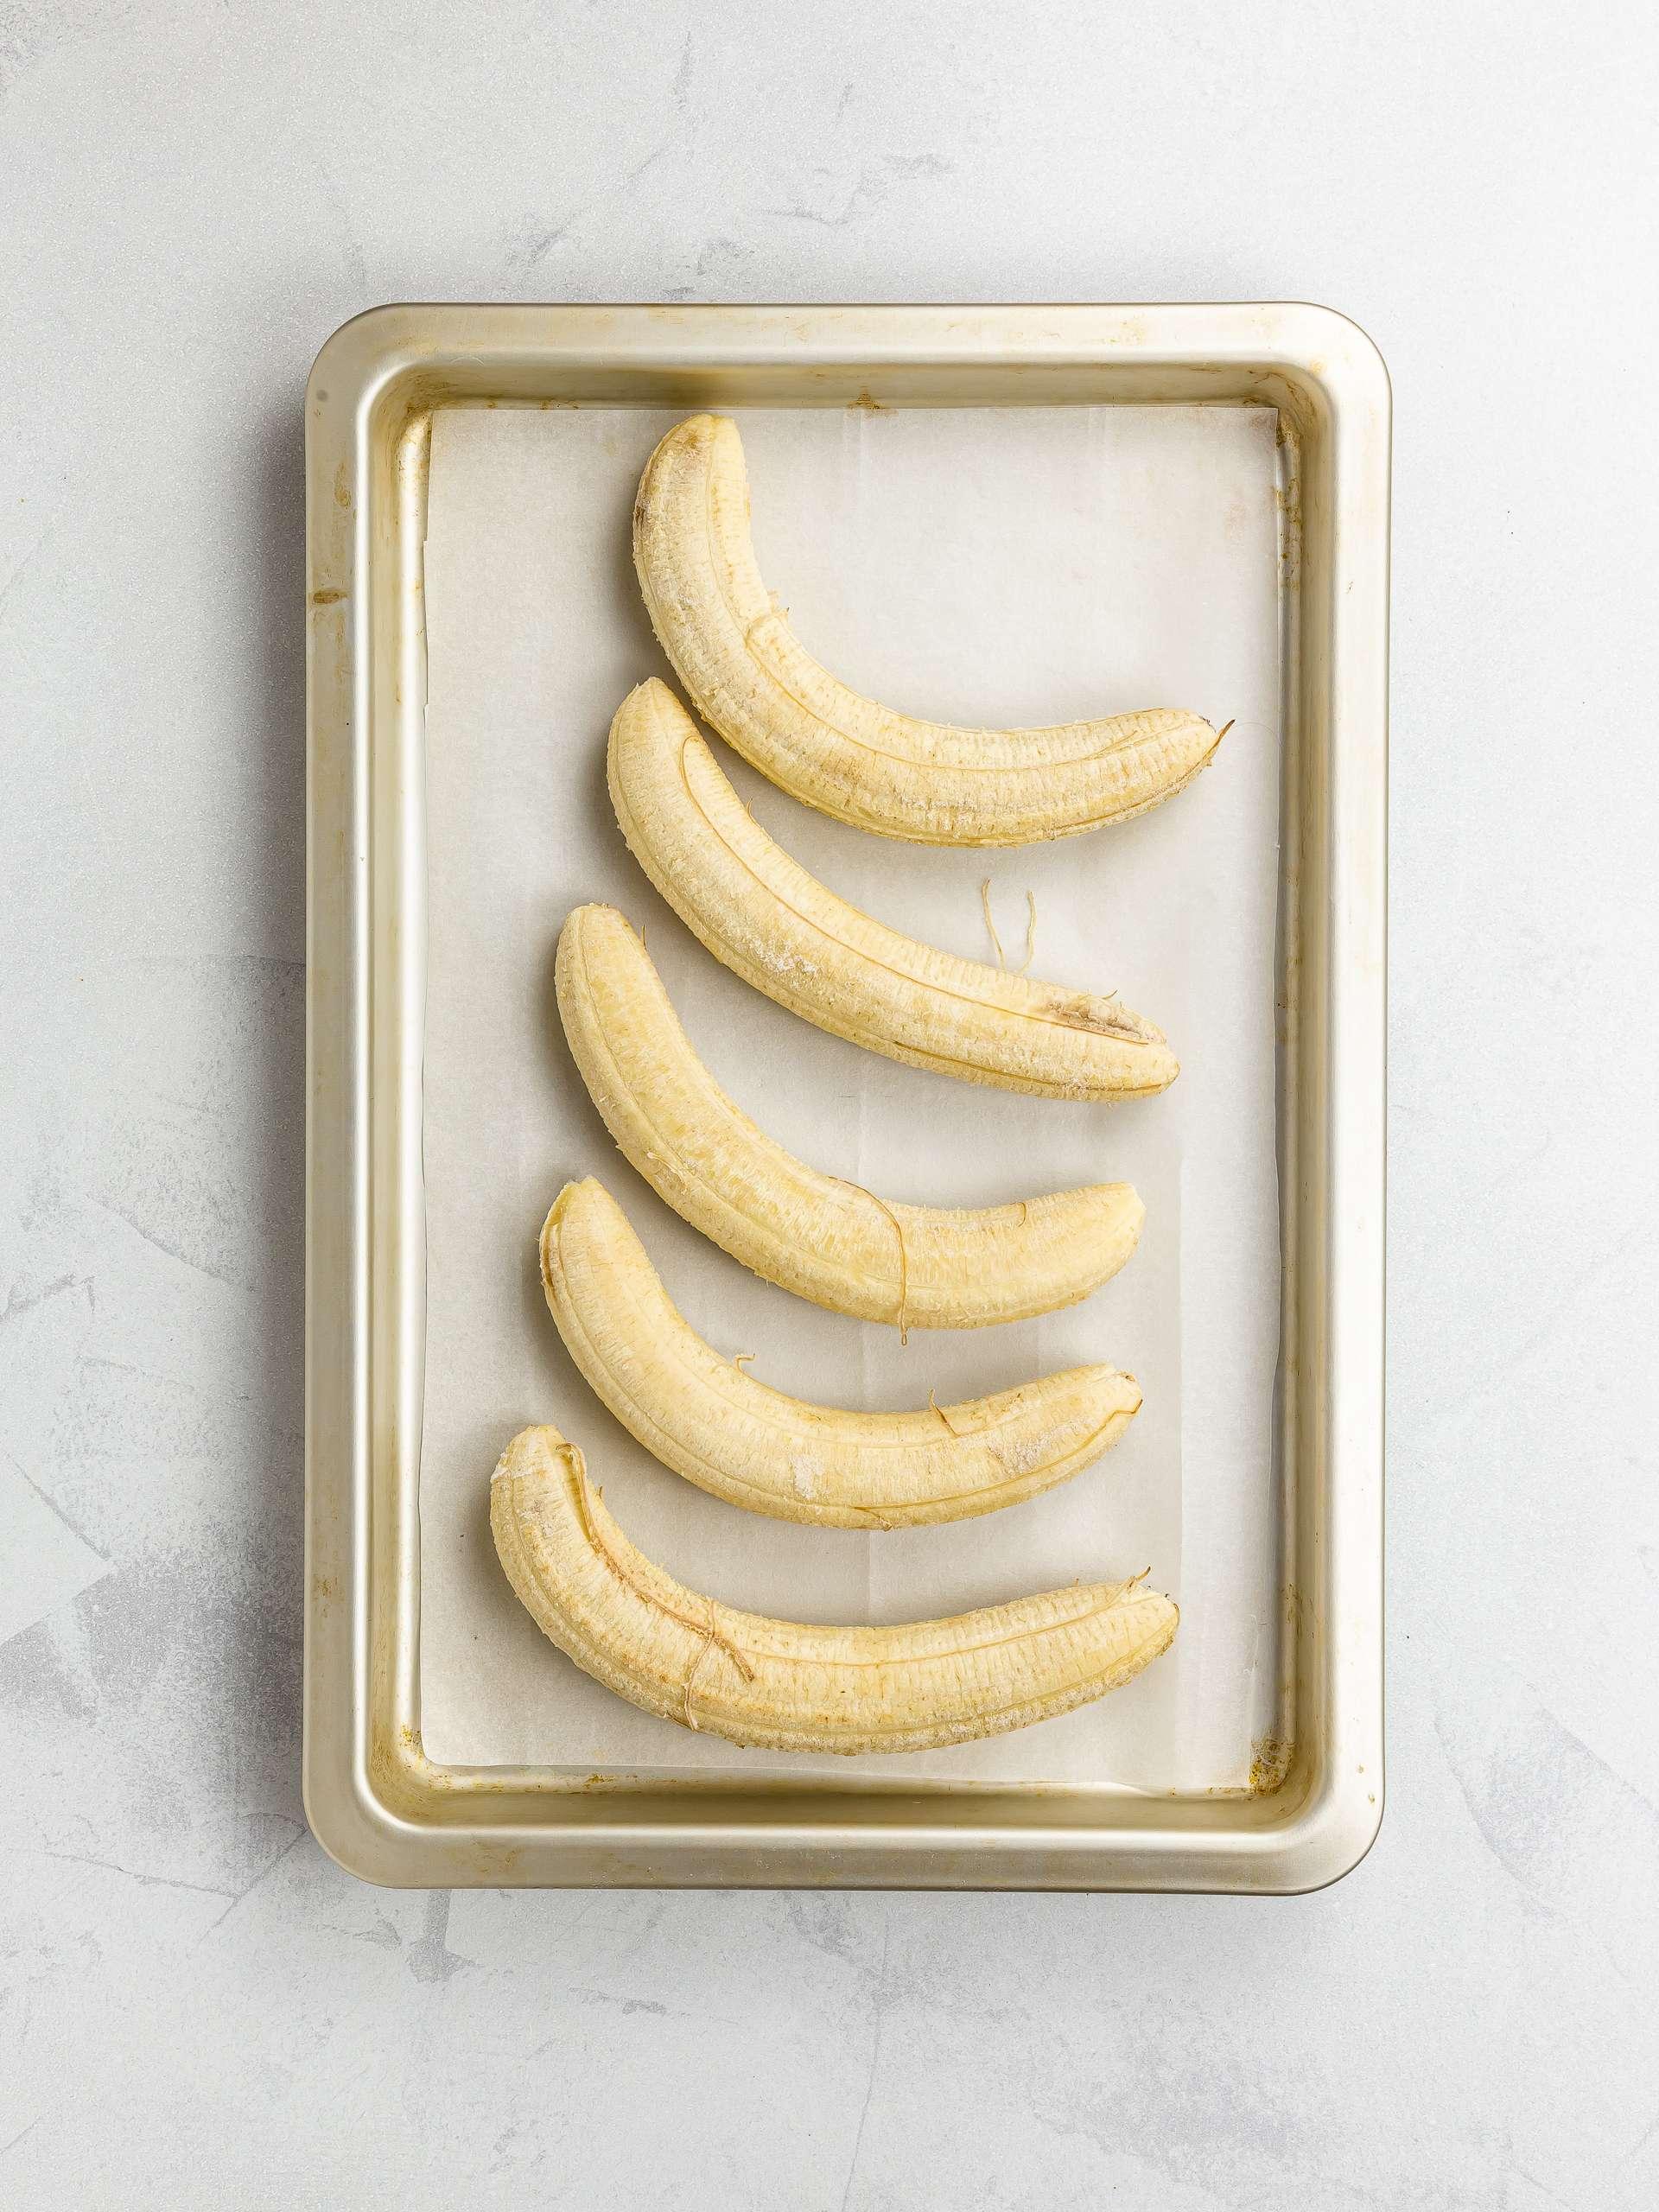 frozen bananas on a tray